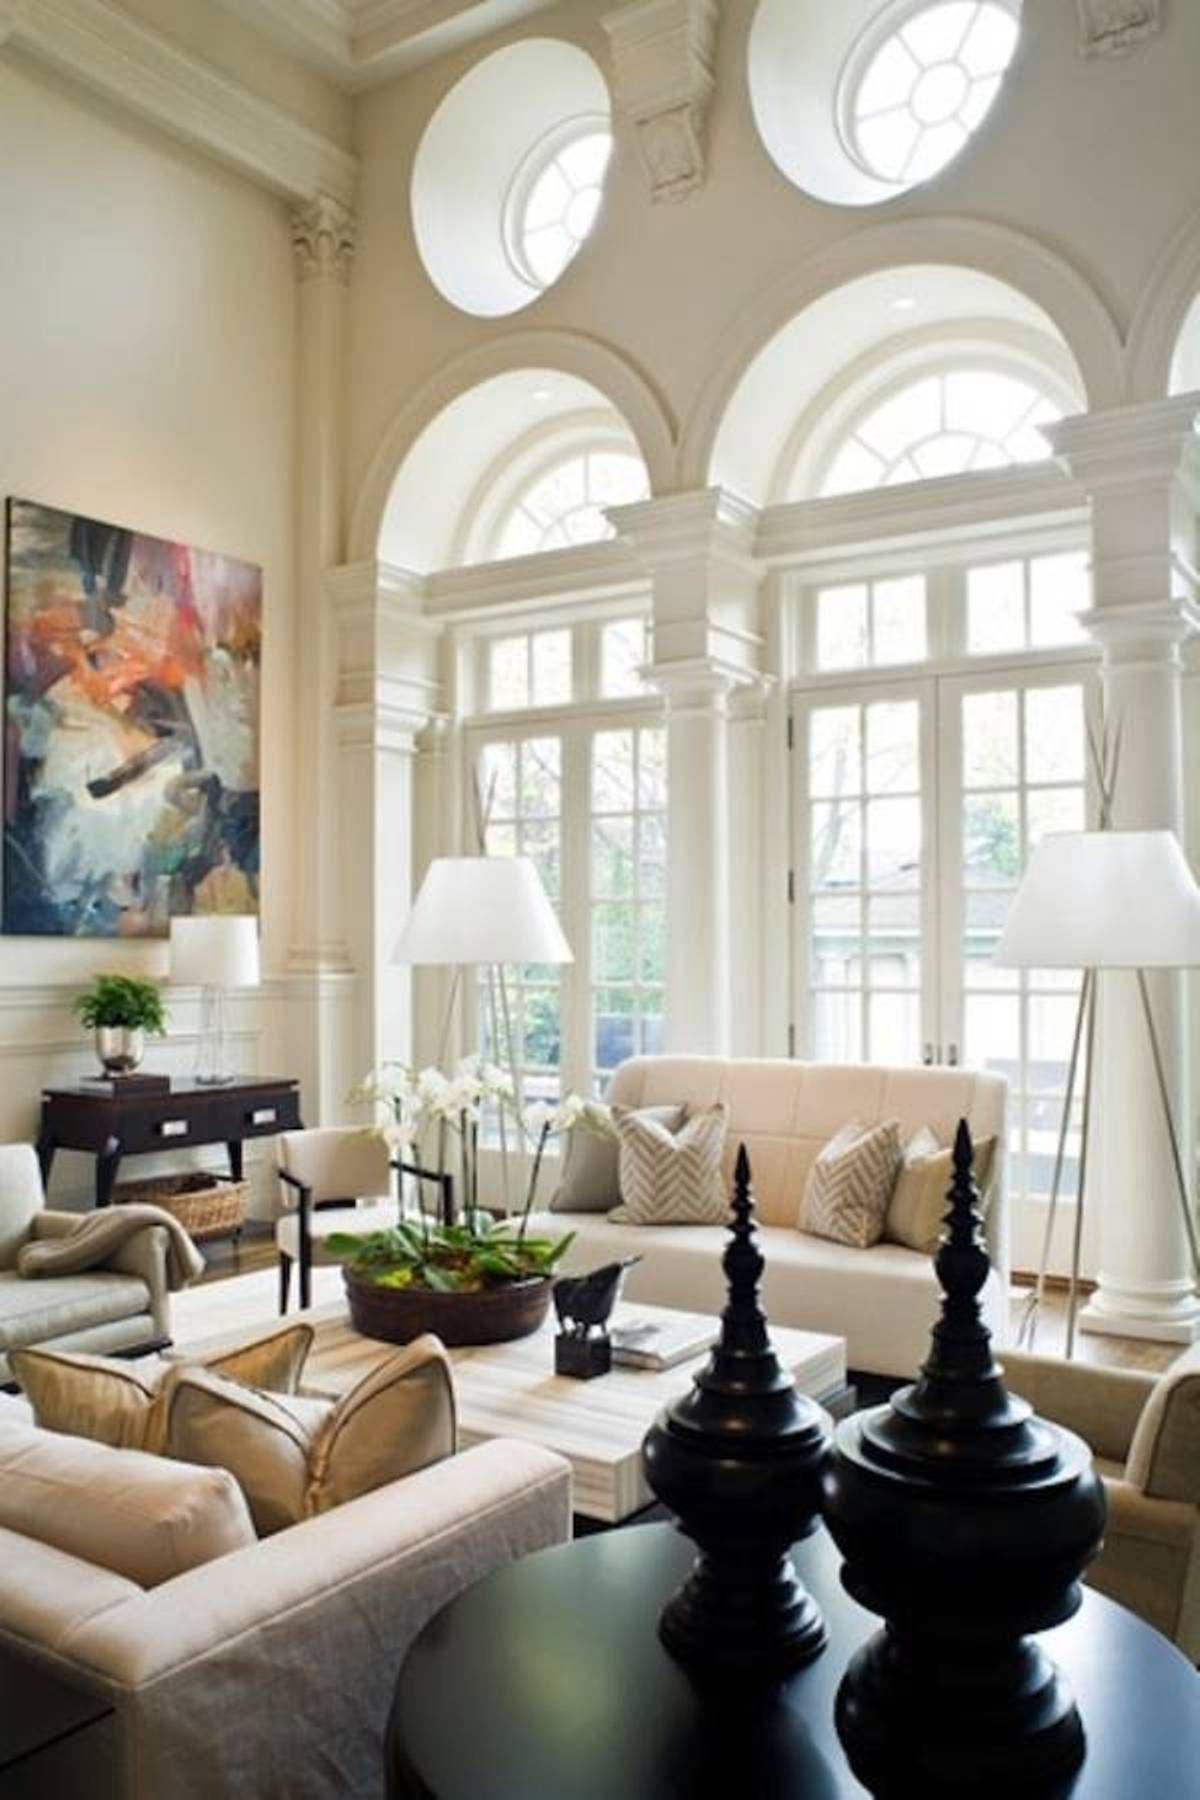 25 Tall Ceiling Living Room Design Ideas   Design Ideas ...